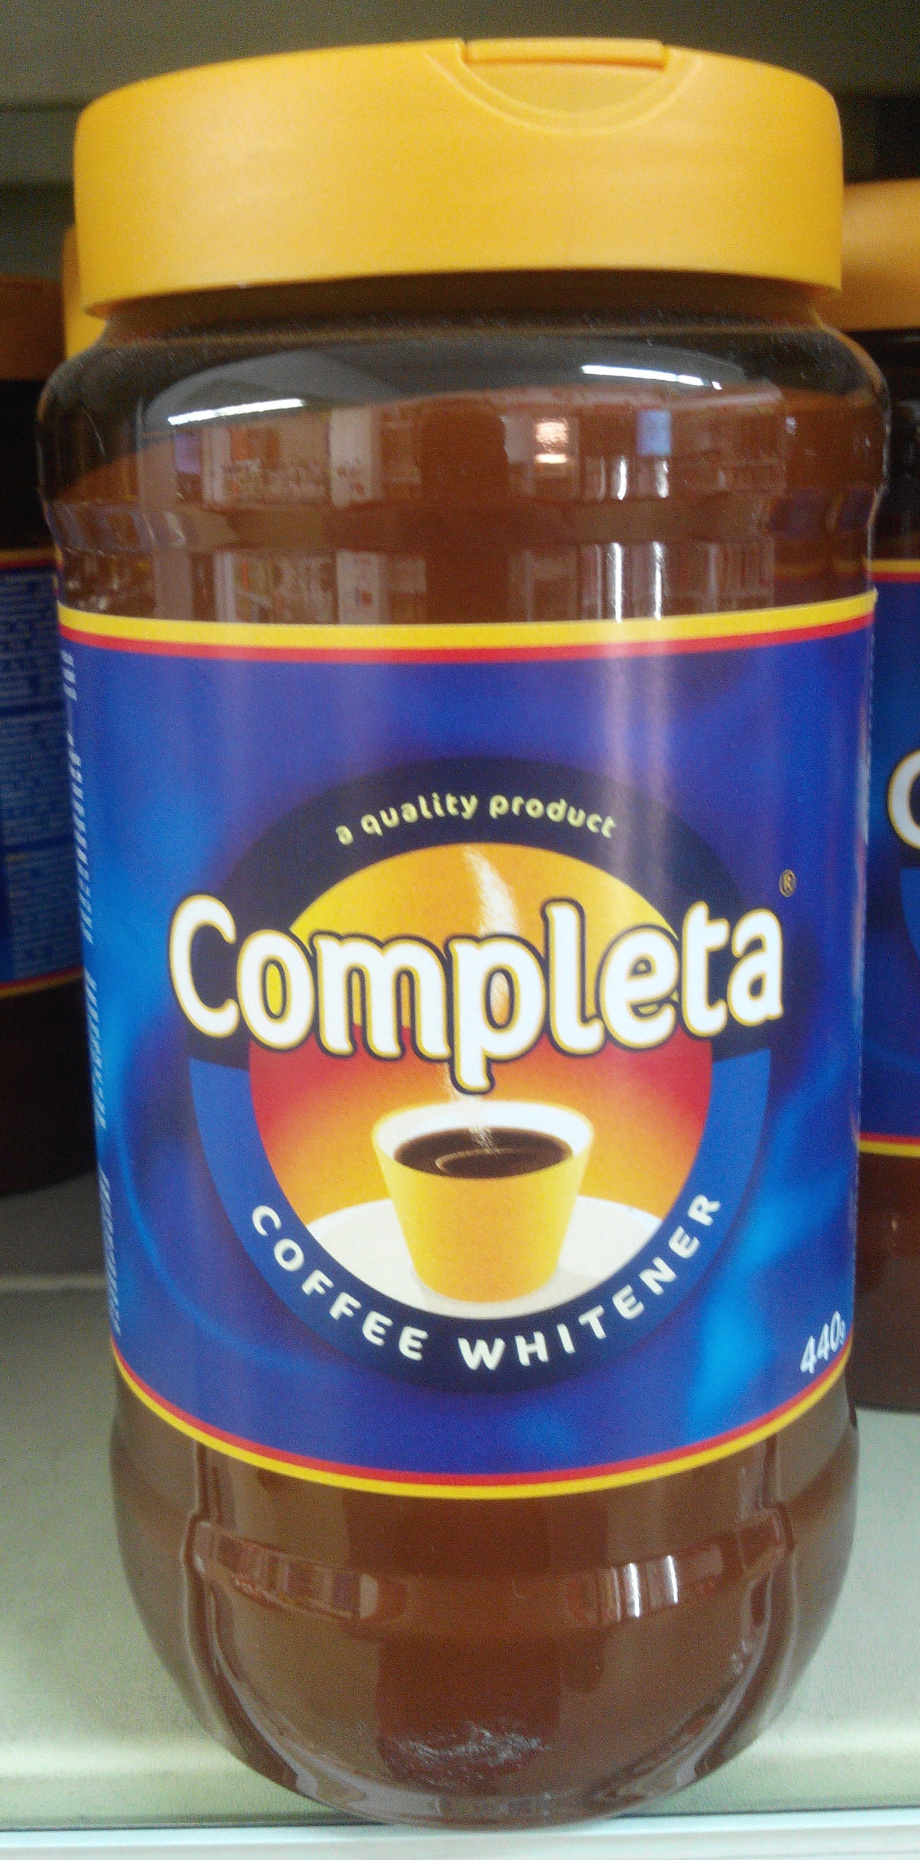 Coffee Whitener - Product